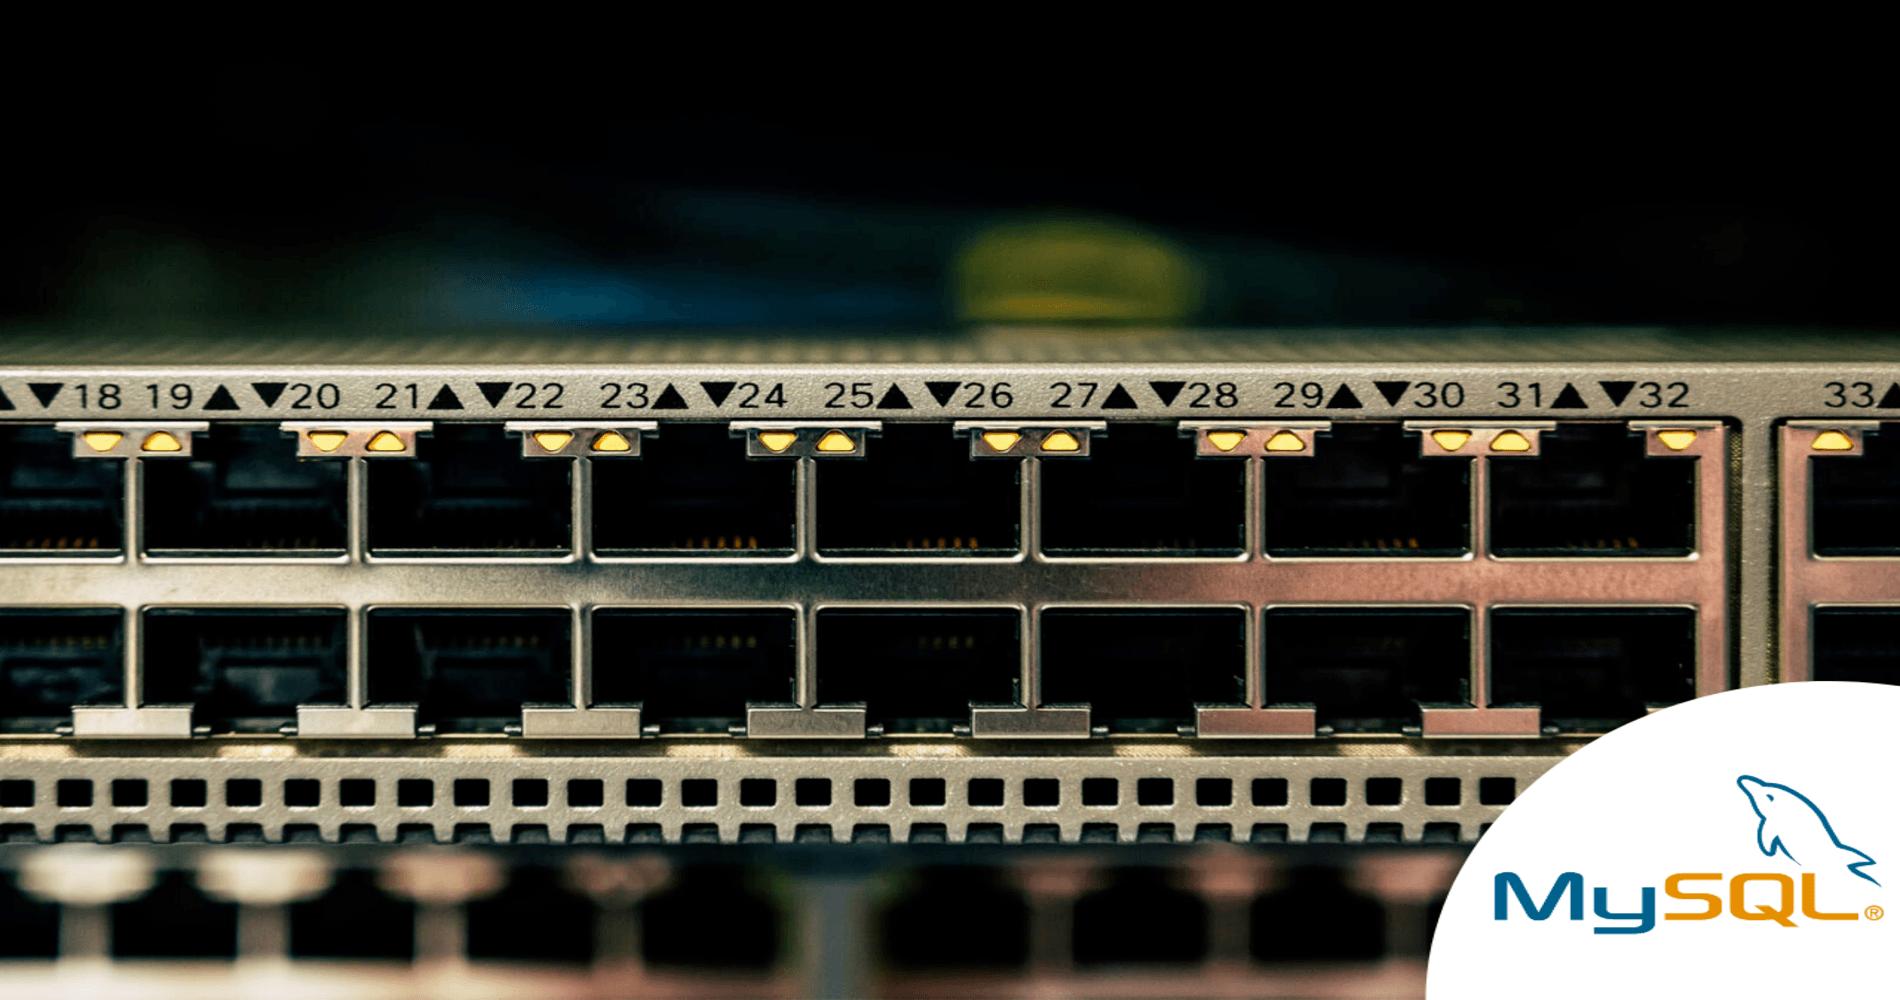 MySQL Cluster-background image